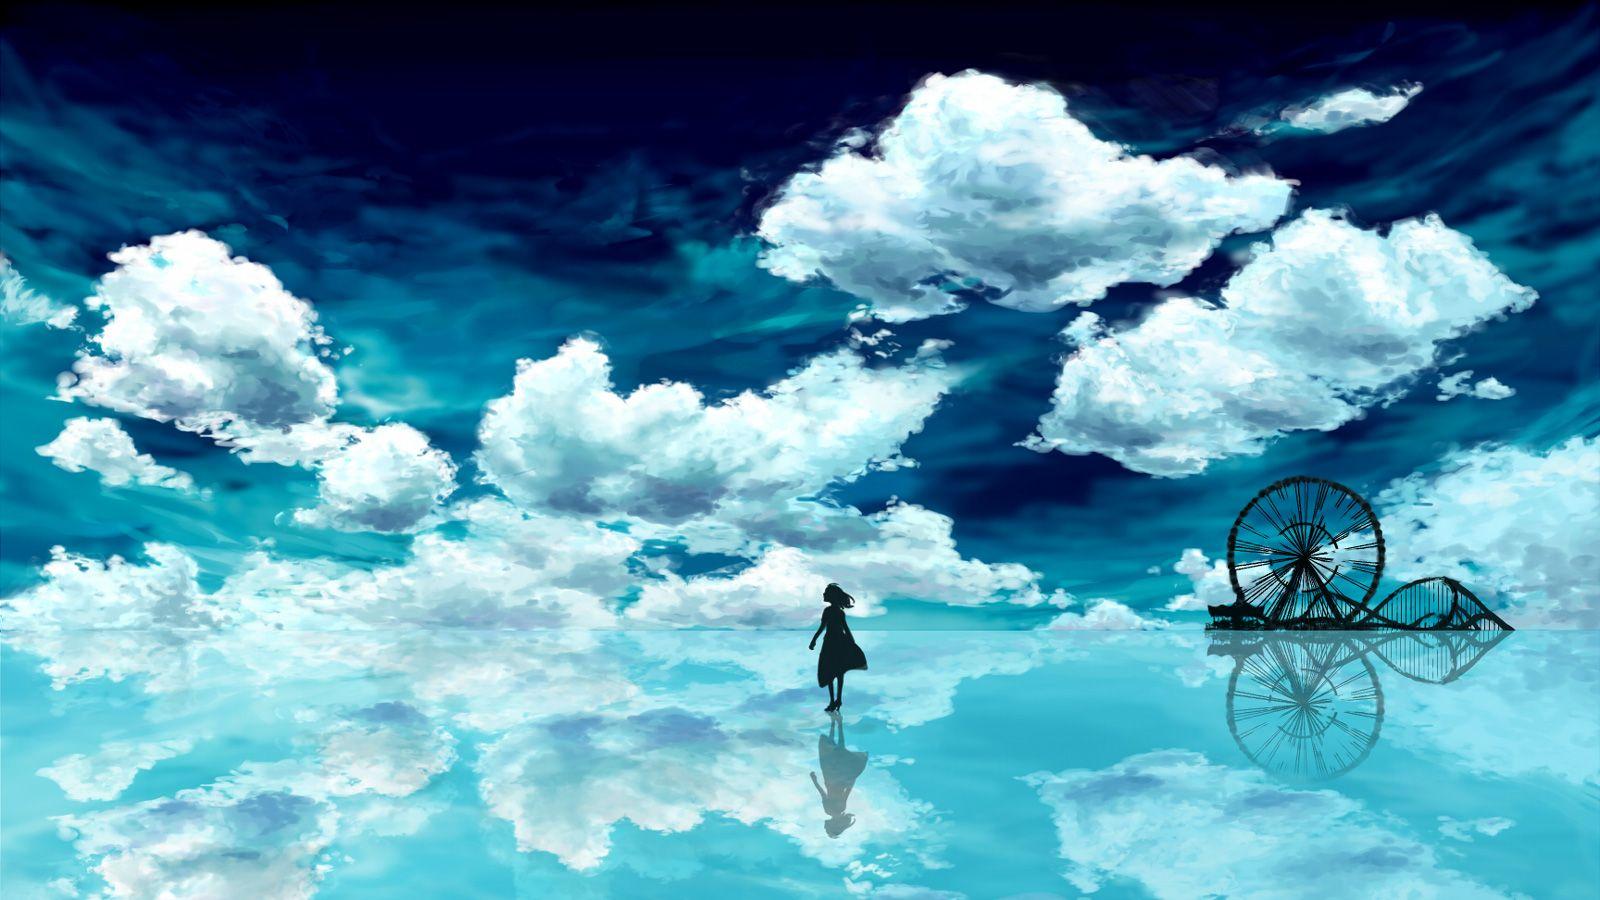 Anime tr n thi n ng t m v i google c pinterest - Beautiful anime wallpaper hd ...